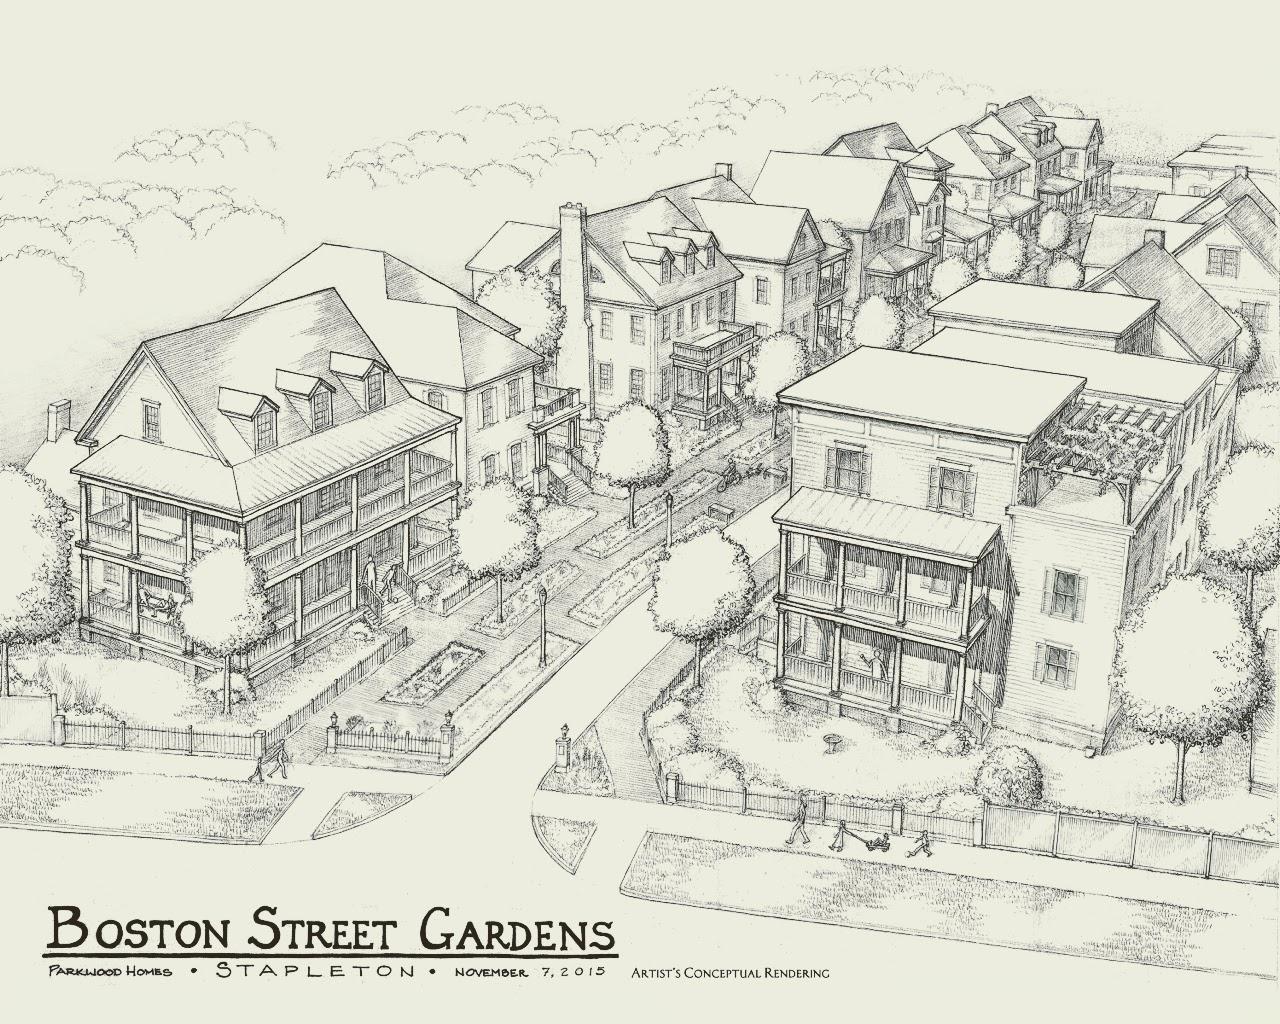 Daniel's original sketch of Boston Street in Wicker Park.